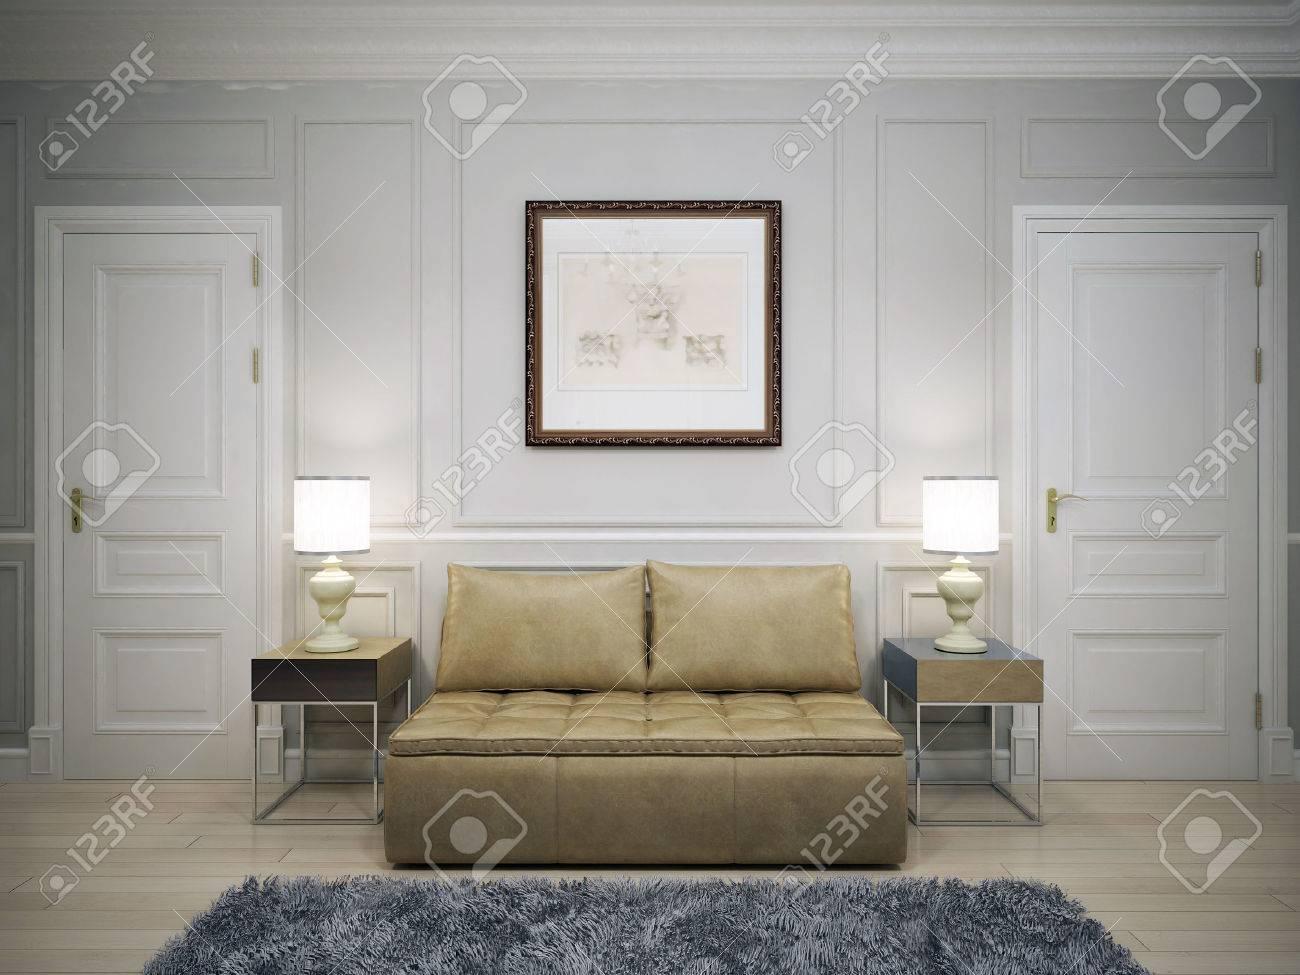 Idée de couloir moderne. 3D render